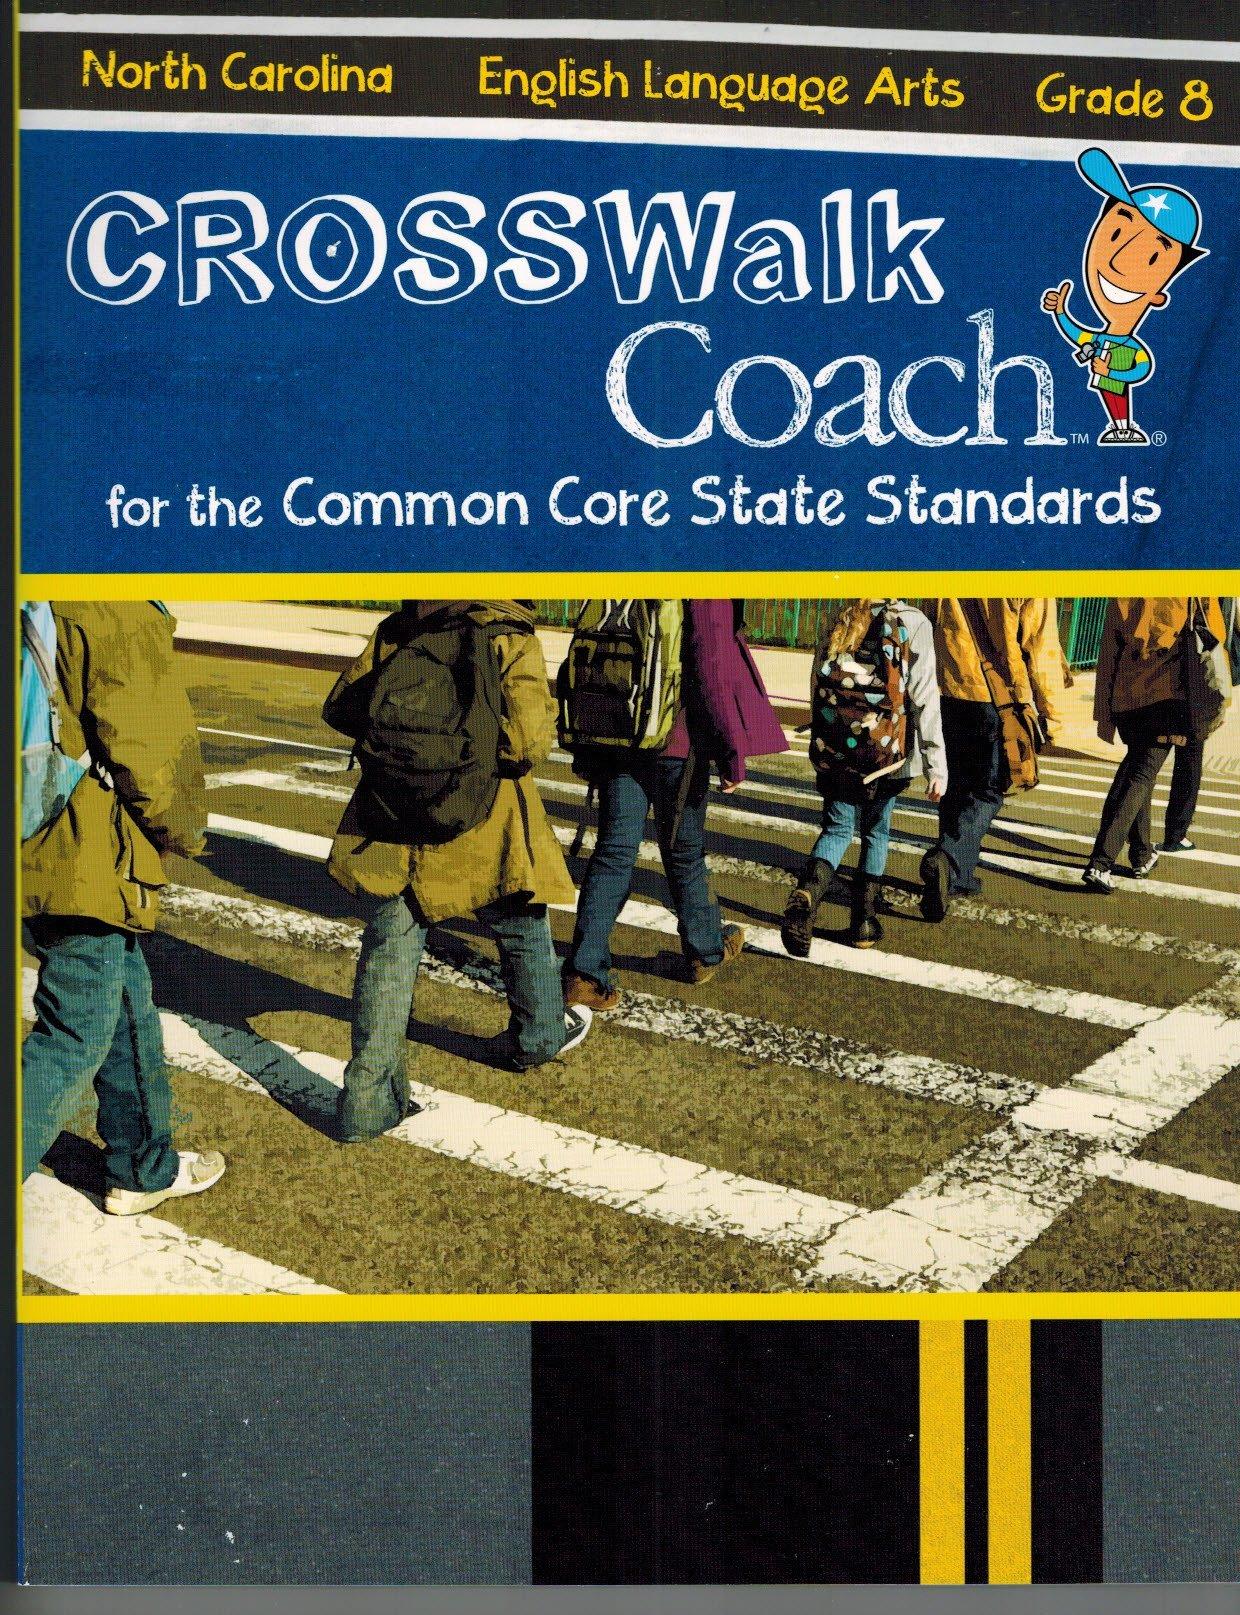 English Language Arts: Grade 8 (CROSSWalk Coach for the Common Core State Standards) PDF